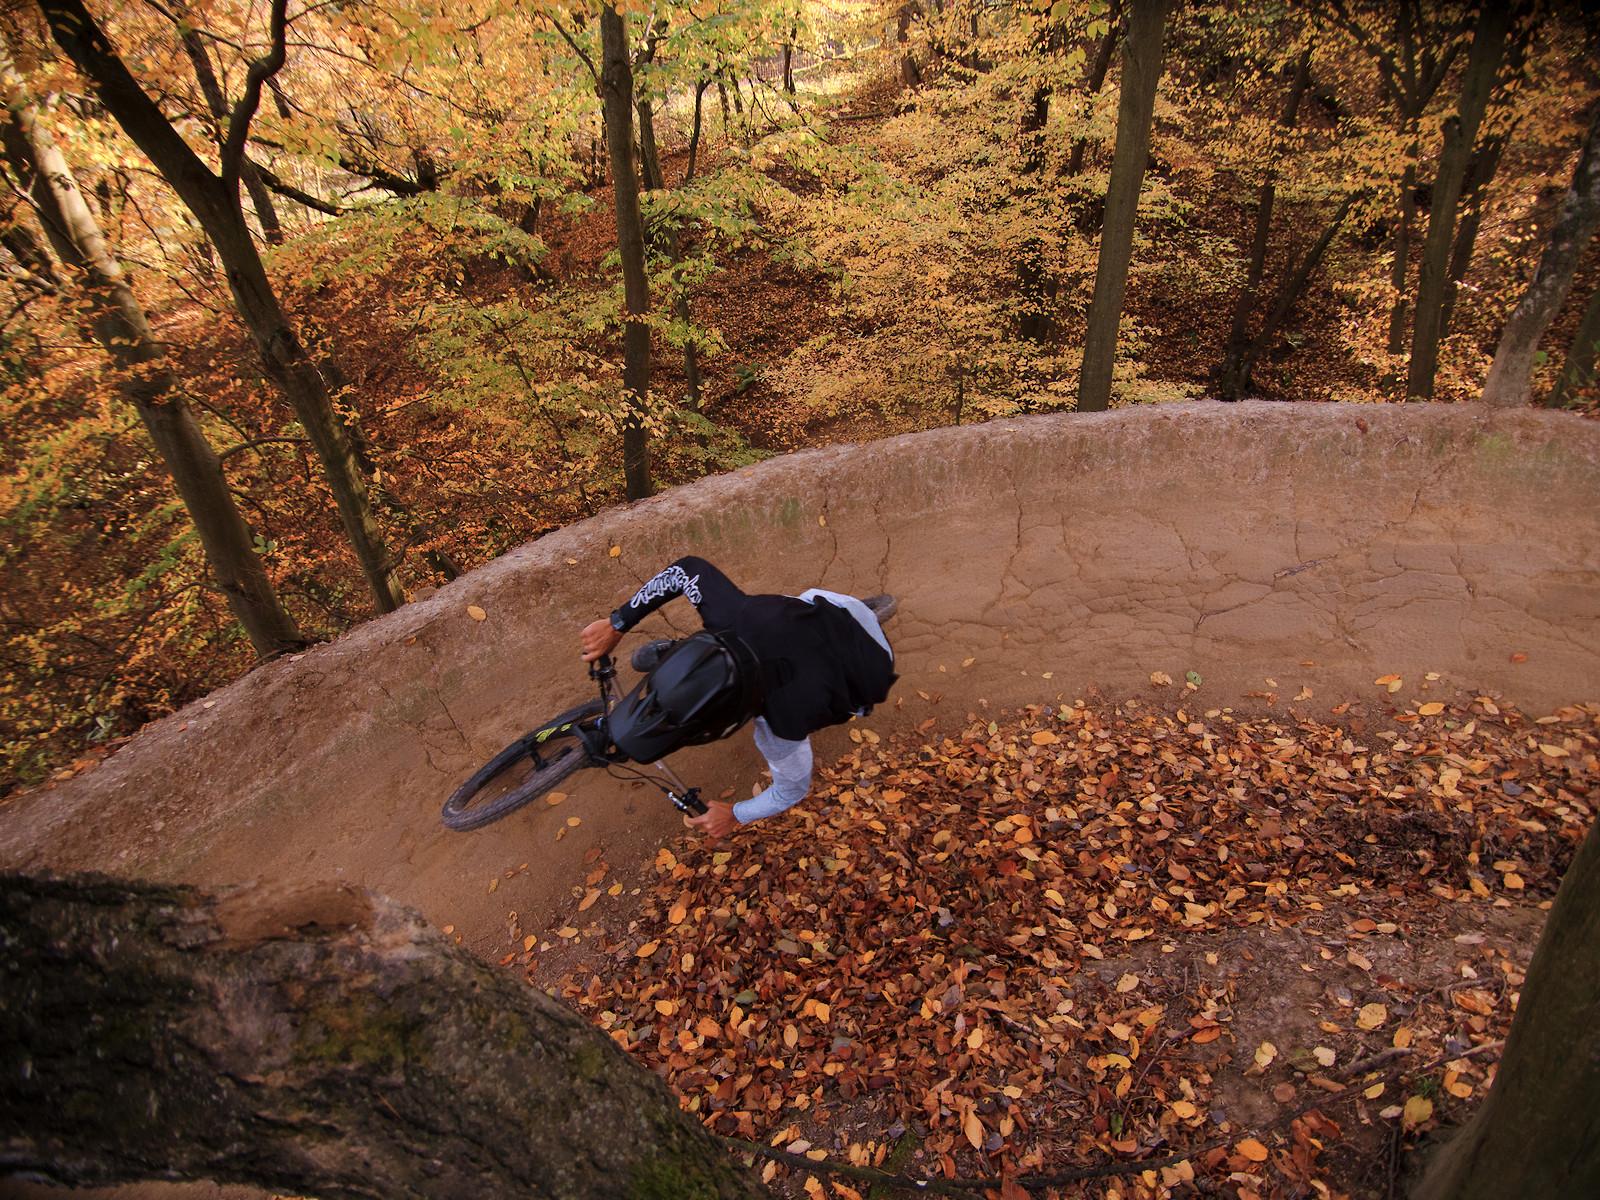 Autumn in Kalnica - EWIA - Mountain Biking Pictures - Vital MTB